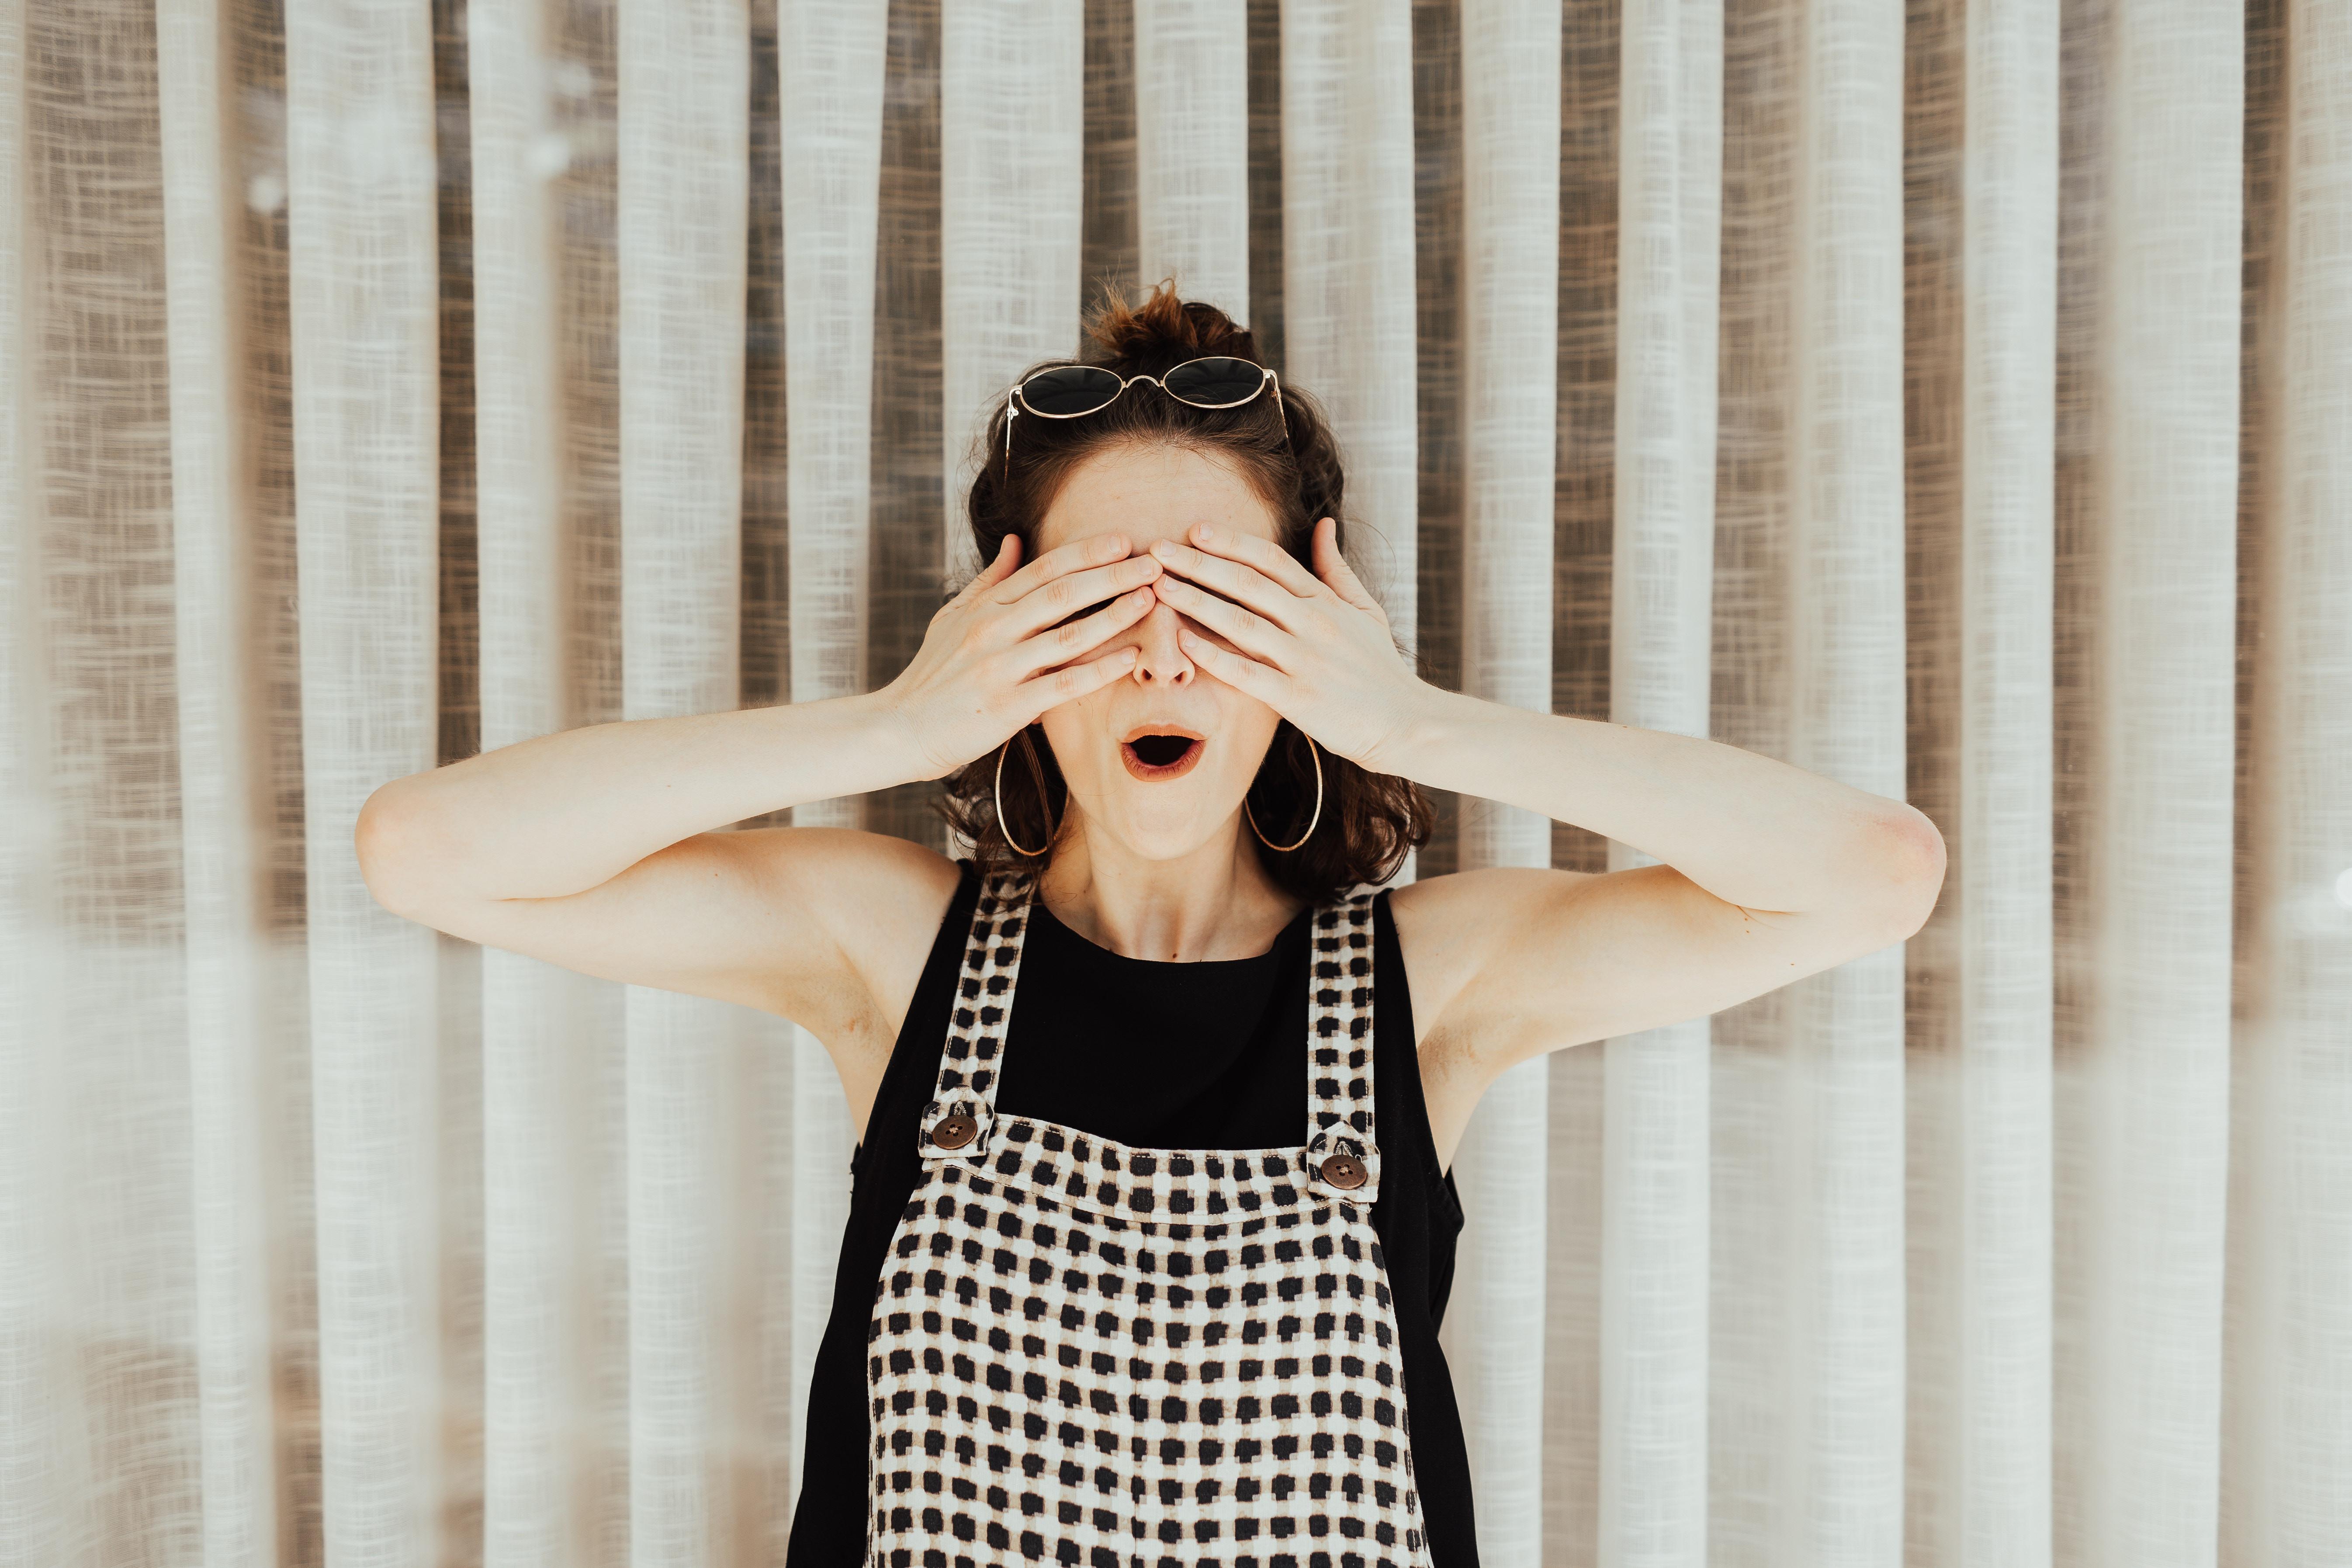 Strottenhoofd massage & Bars behandeling